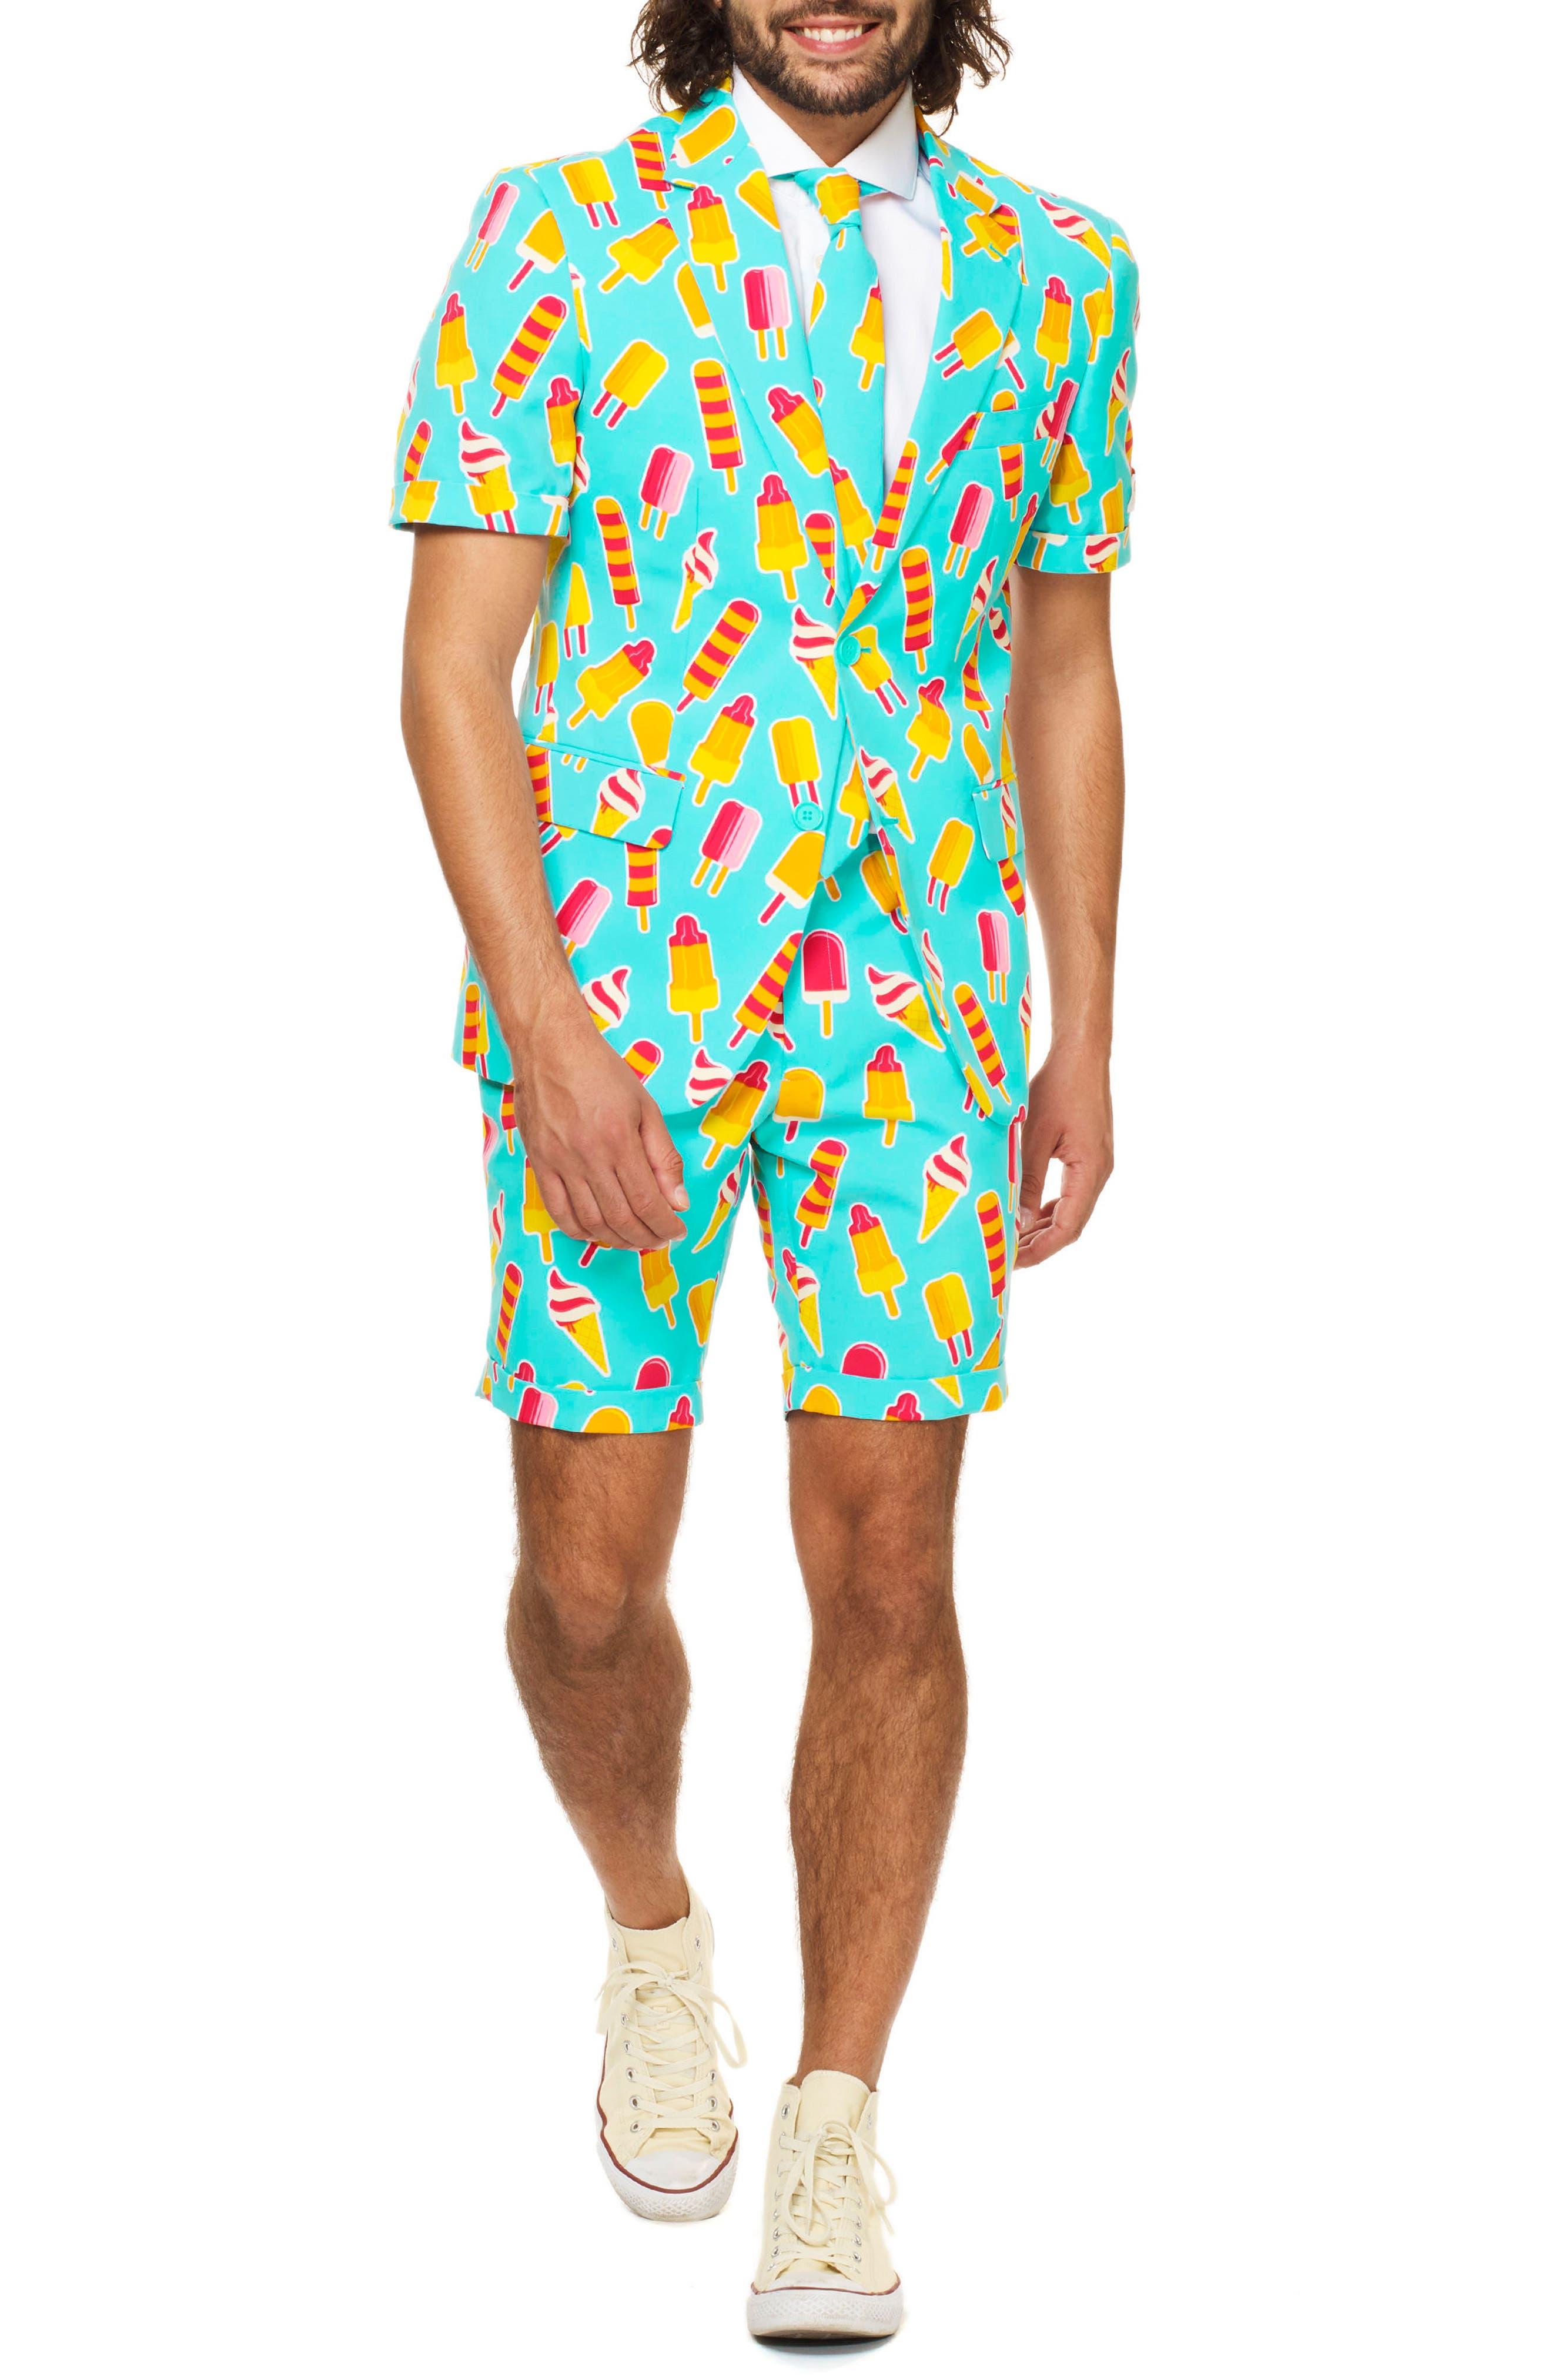 Summer Cool Cones Trim Fit Two-Piece Short Suit with Tie,                             Main thumbnail 1, color,                             450